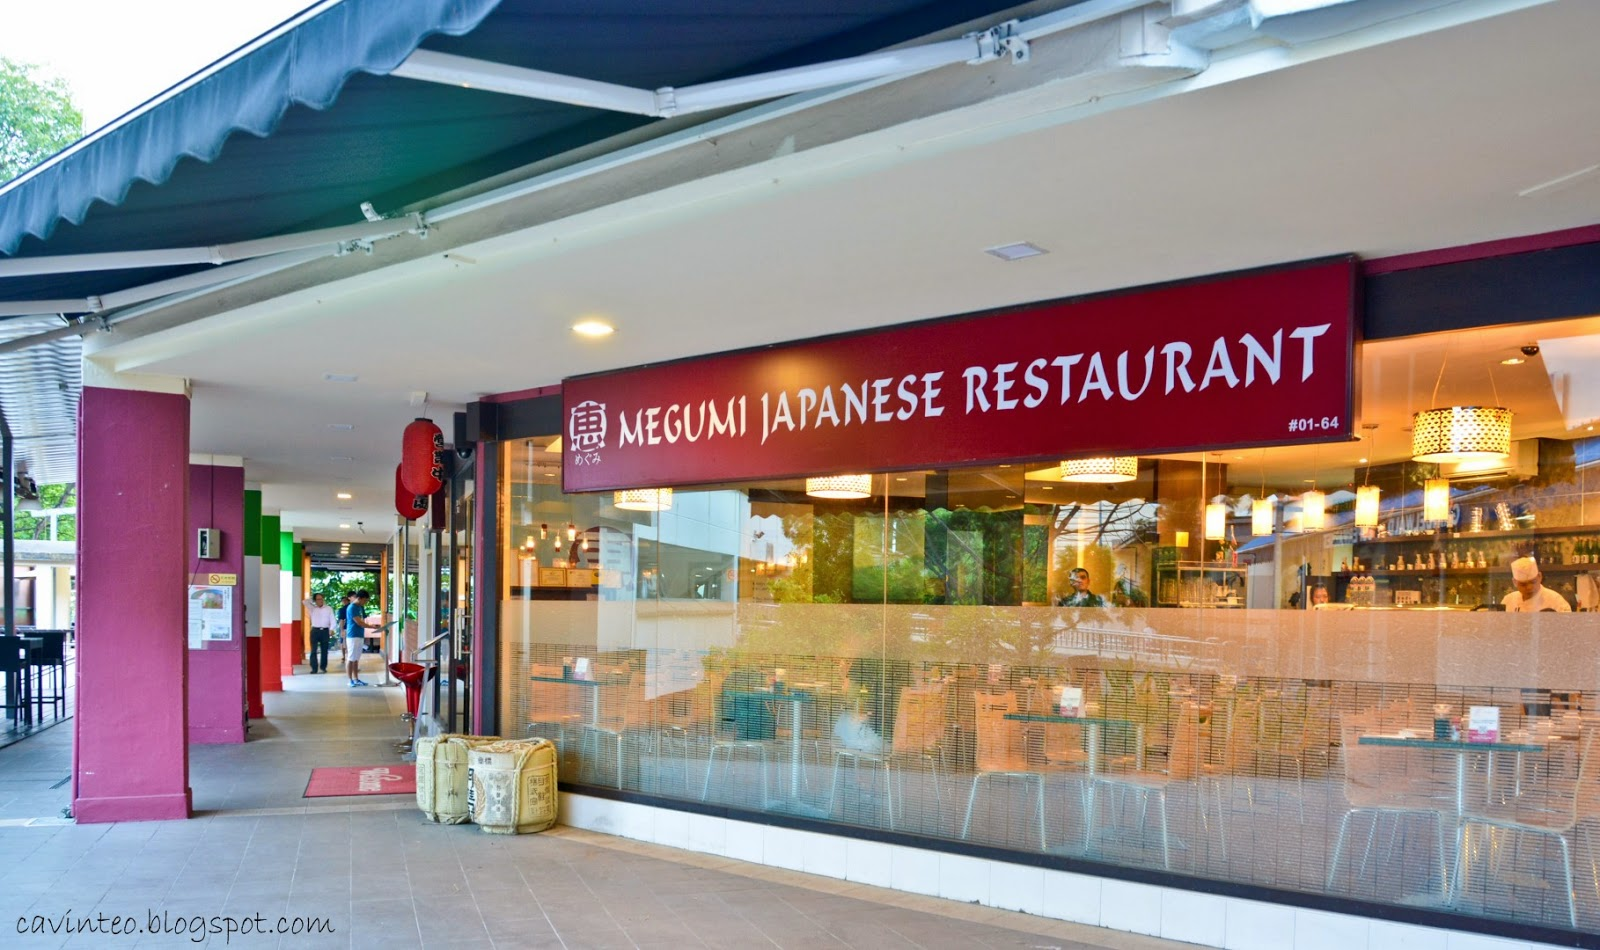 Megumi Japanese Restaurant Menu Sunset Way